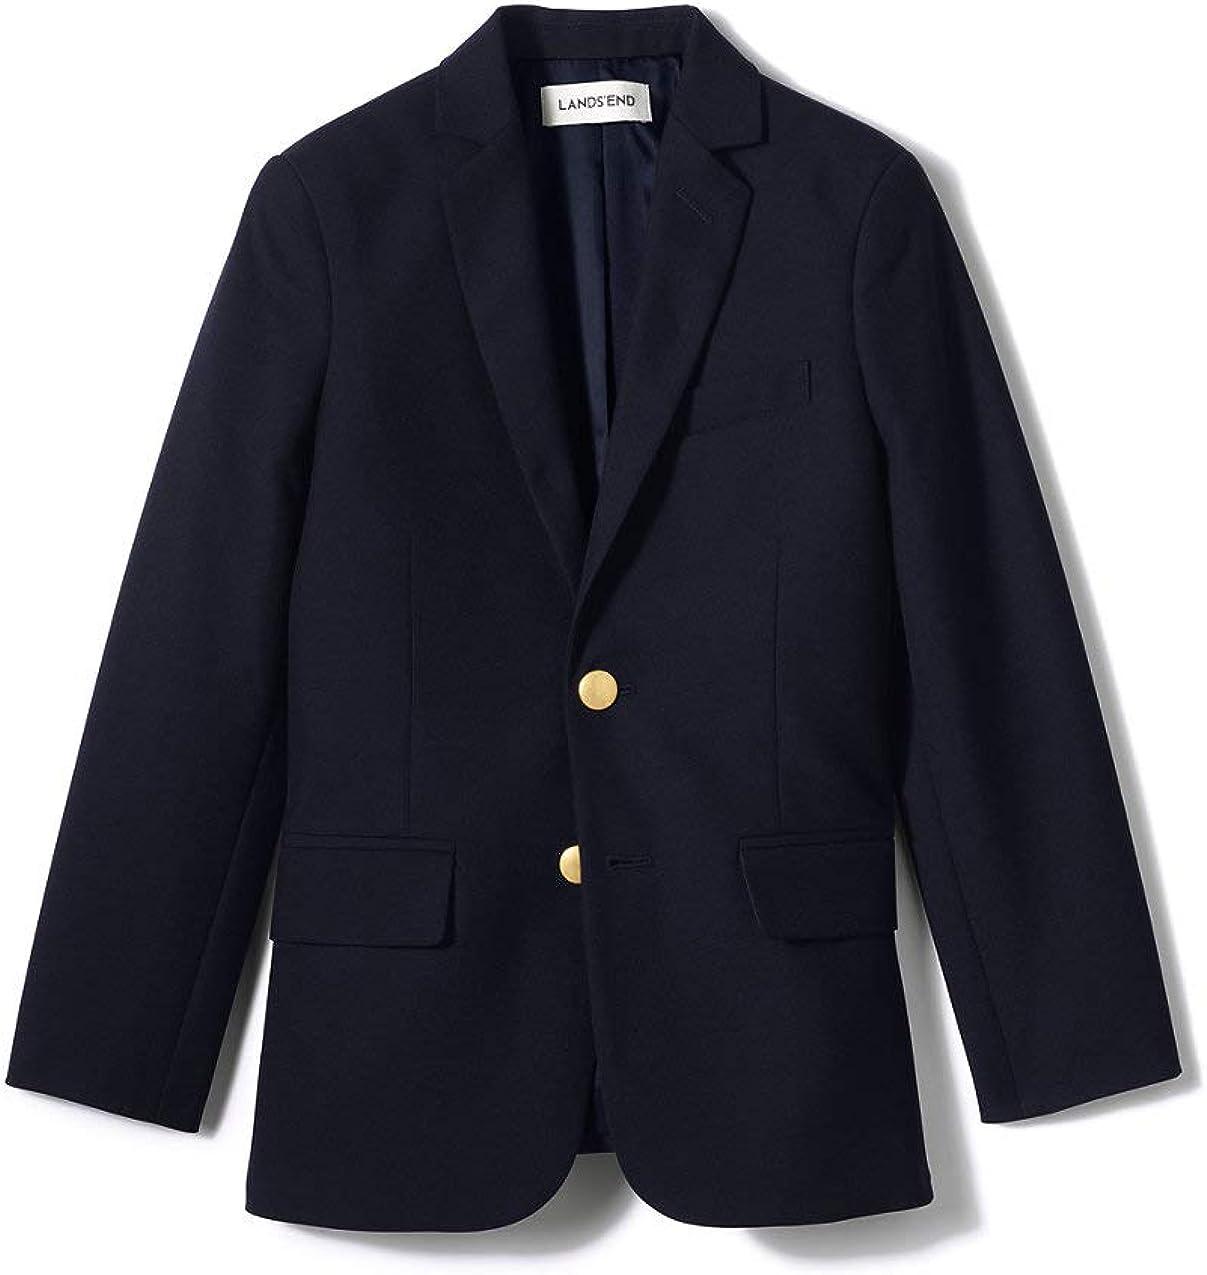 Lands' End School Uniform Boys Tailored Fit Hopsack Blazer